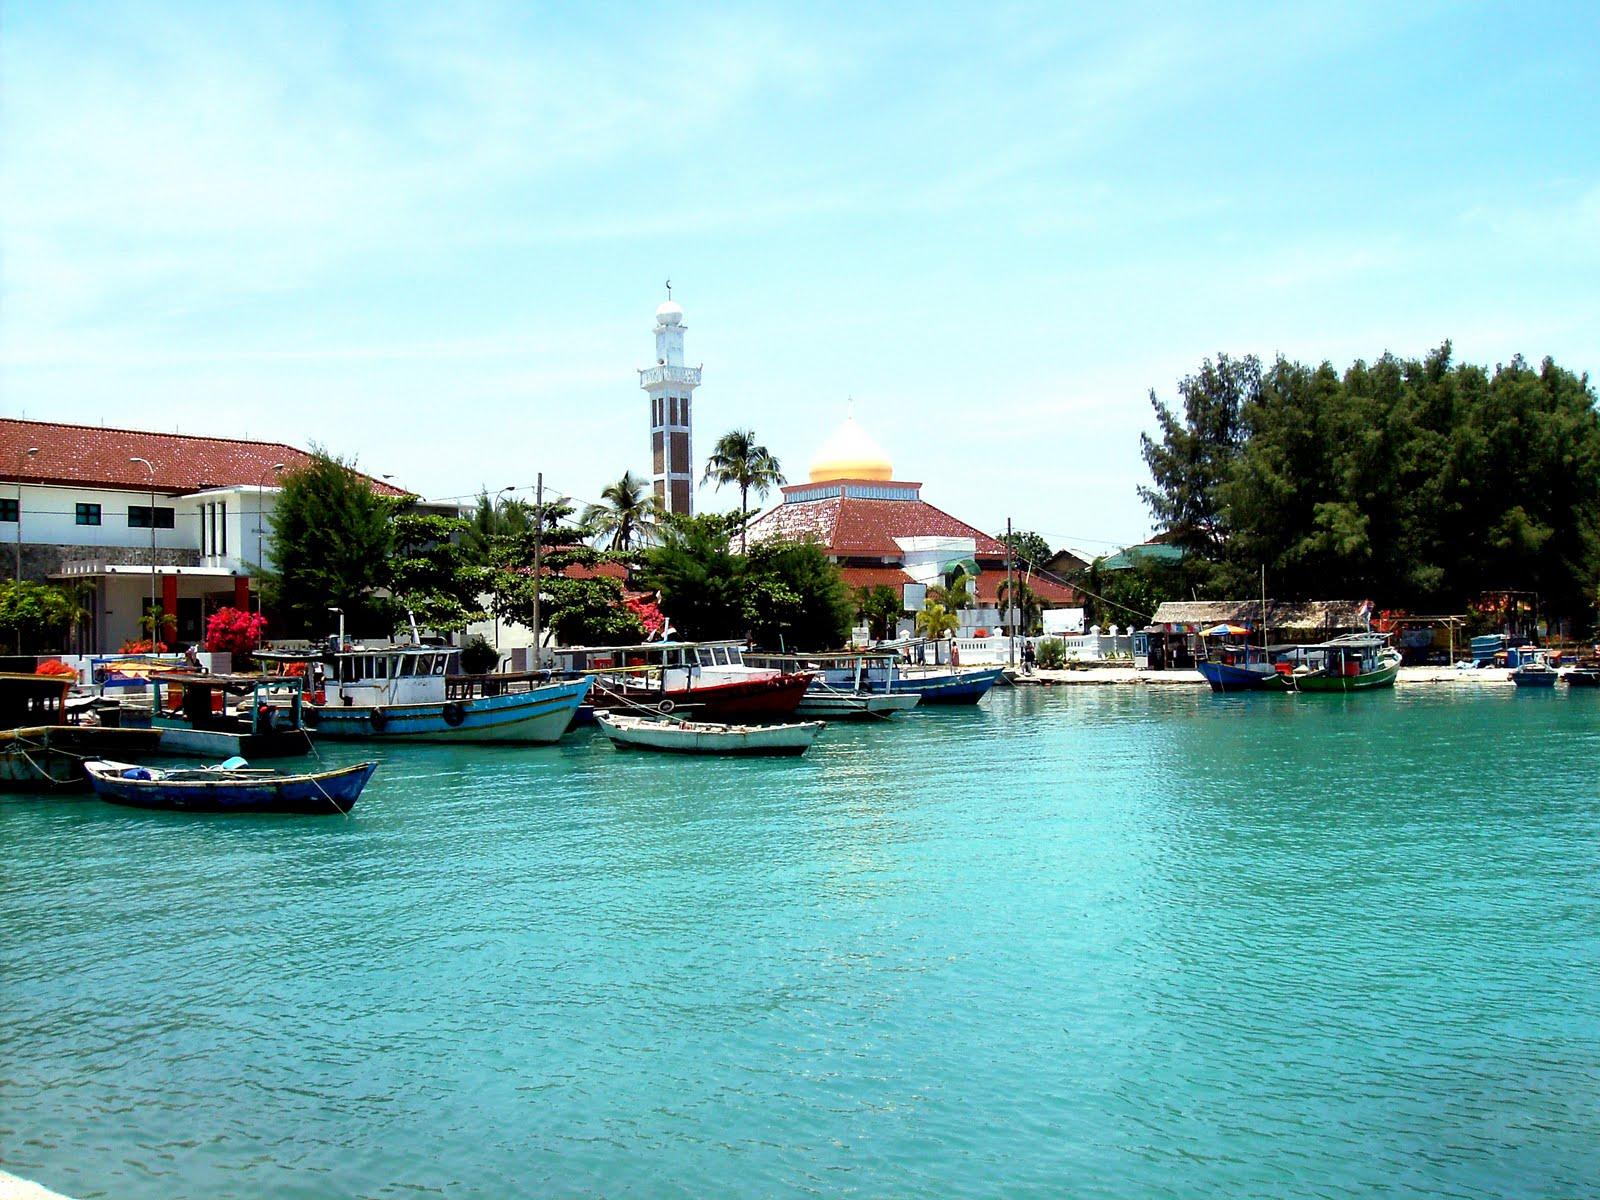 Pemkab Kepulauan Seribu Ubah Strategi Layani Aduan Warga, Strategi Ini Terbilang Lebih Efektif